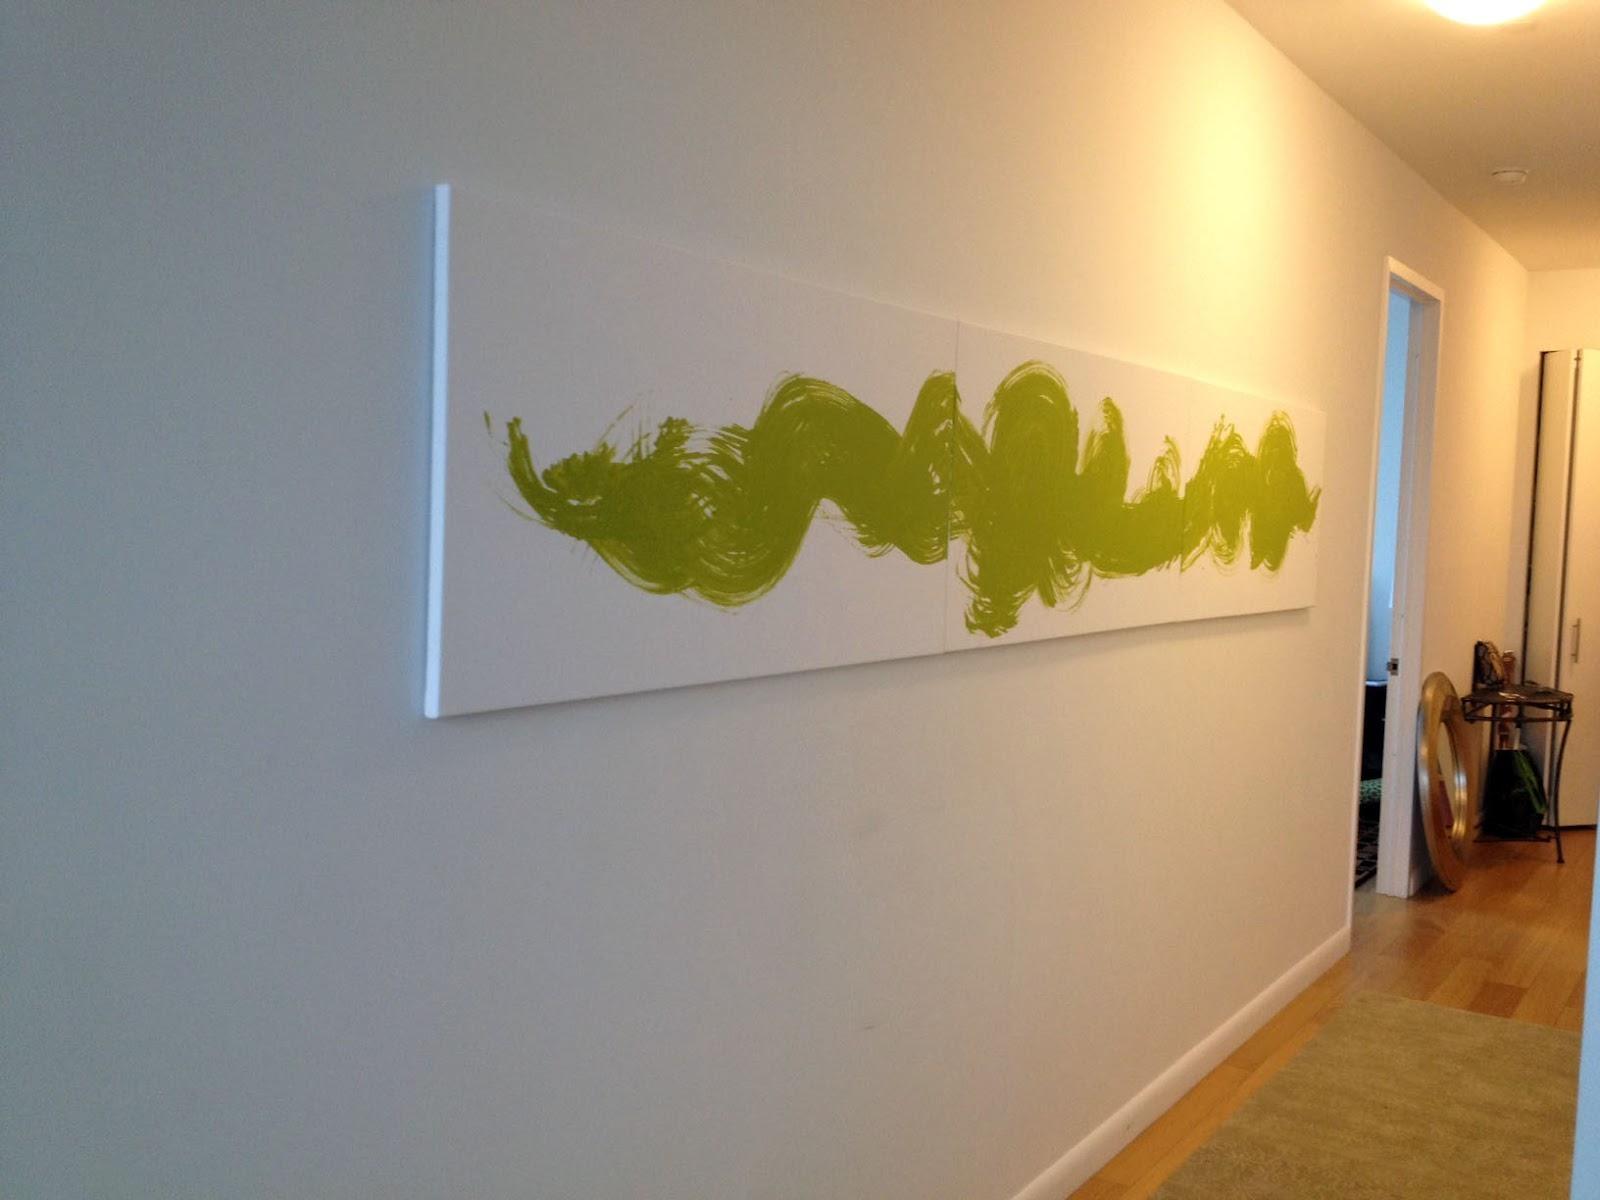 Art Gallery Wall Ideas - Elitflat